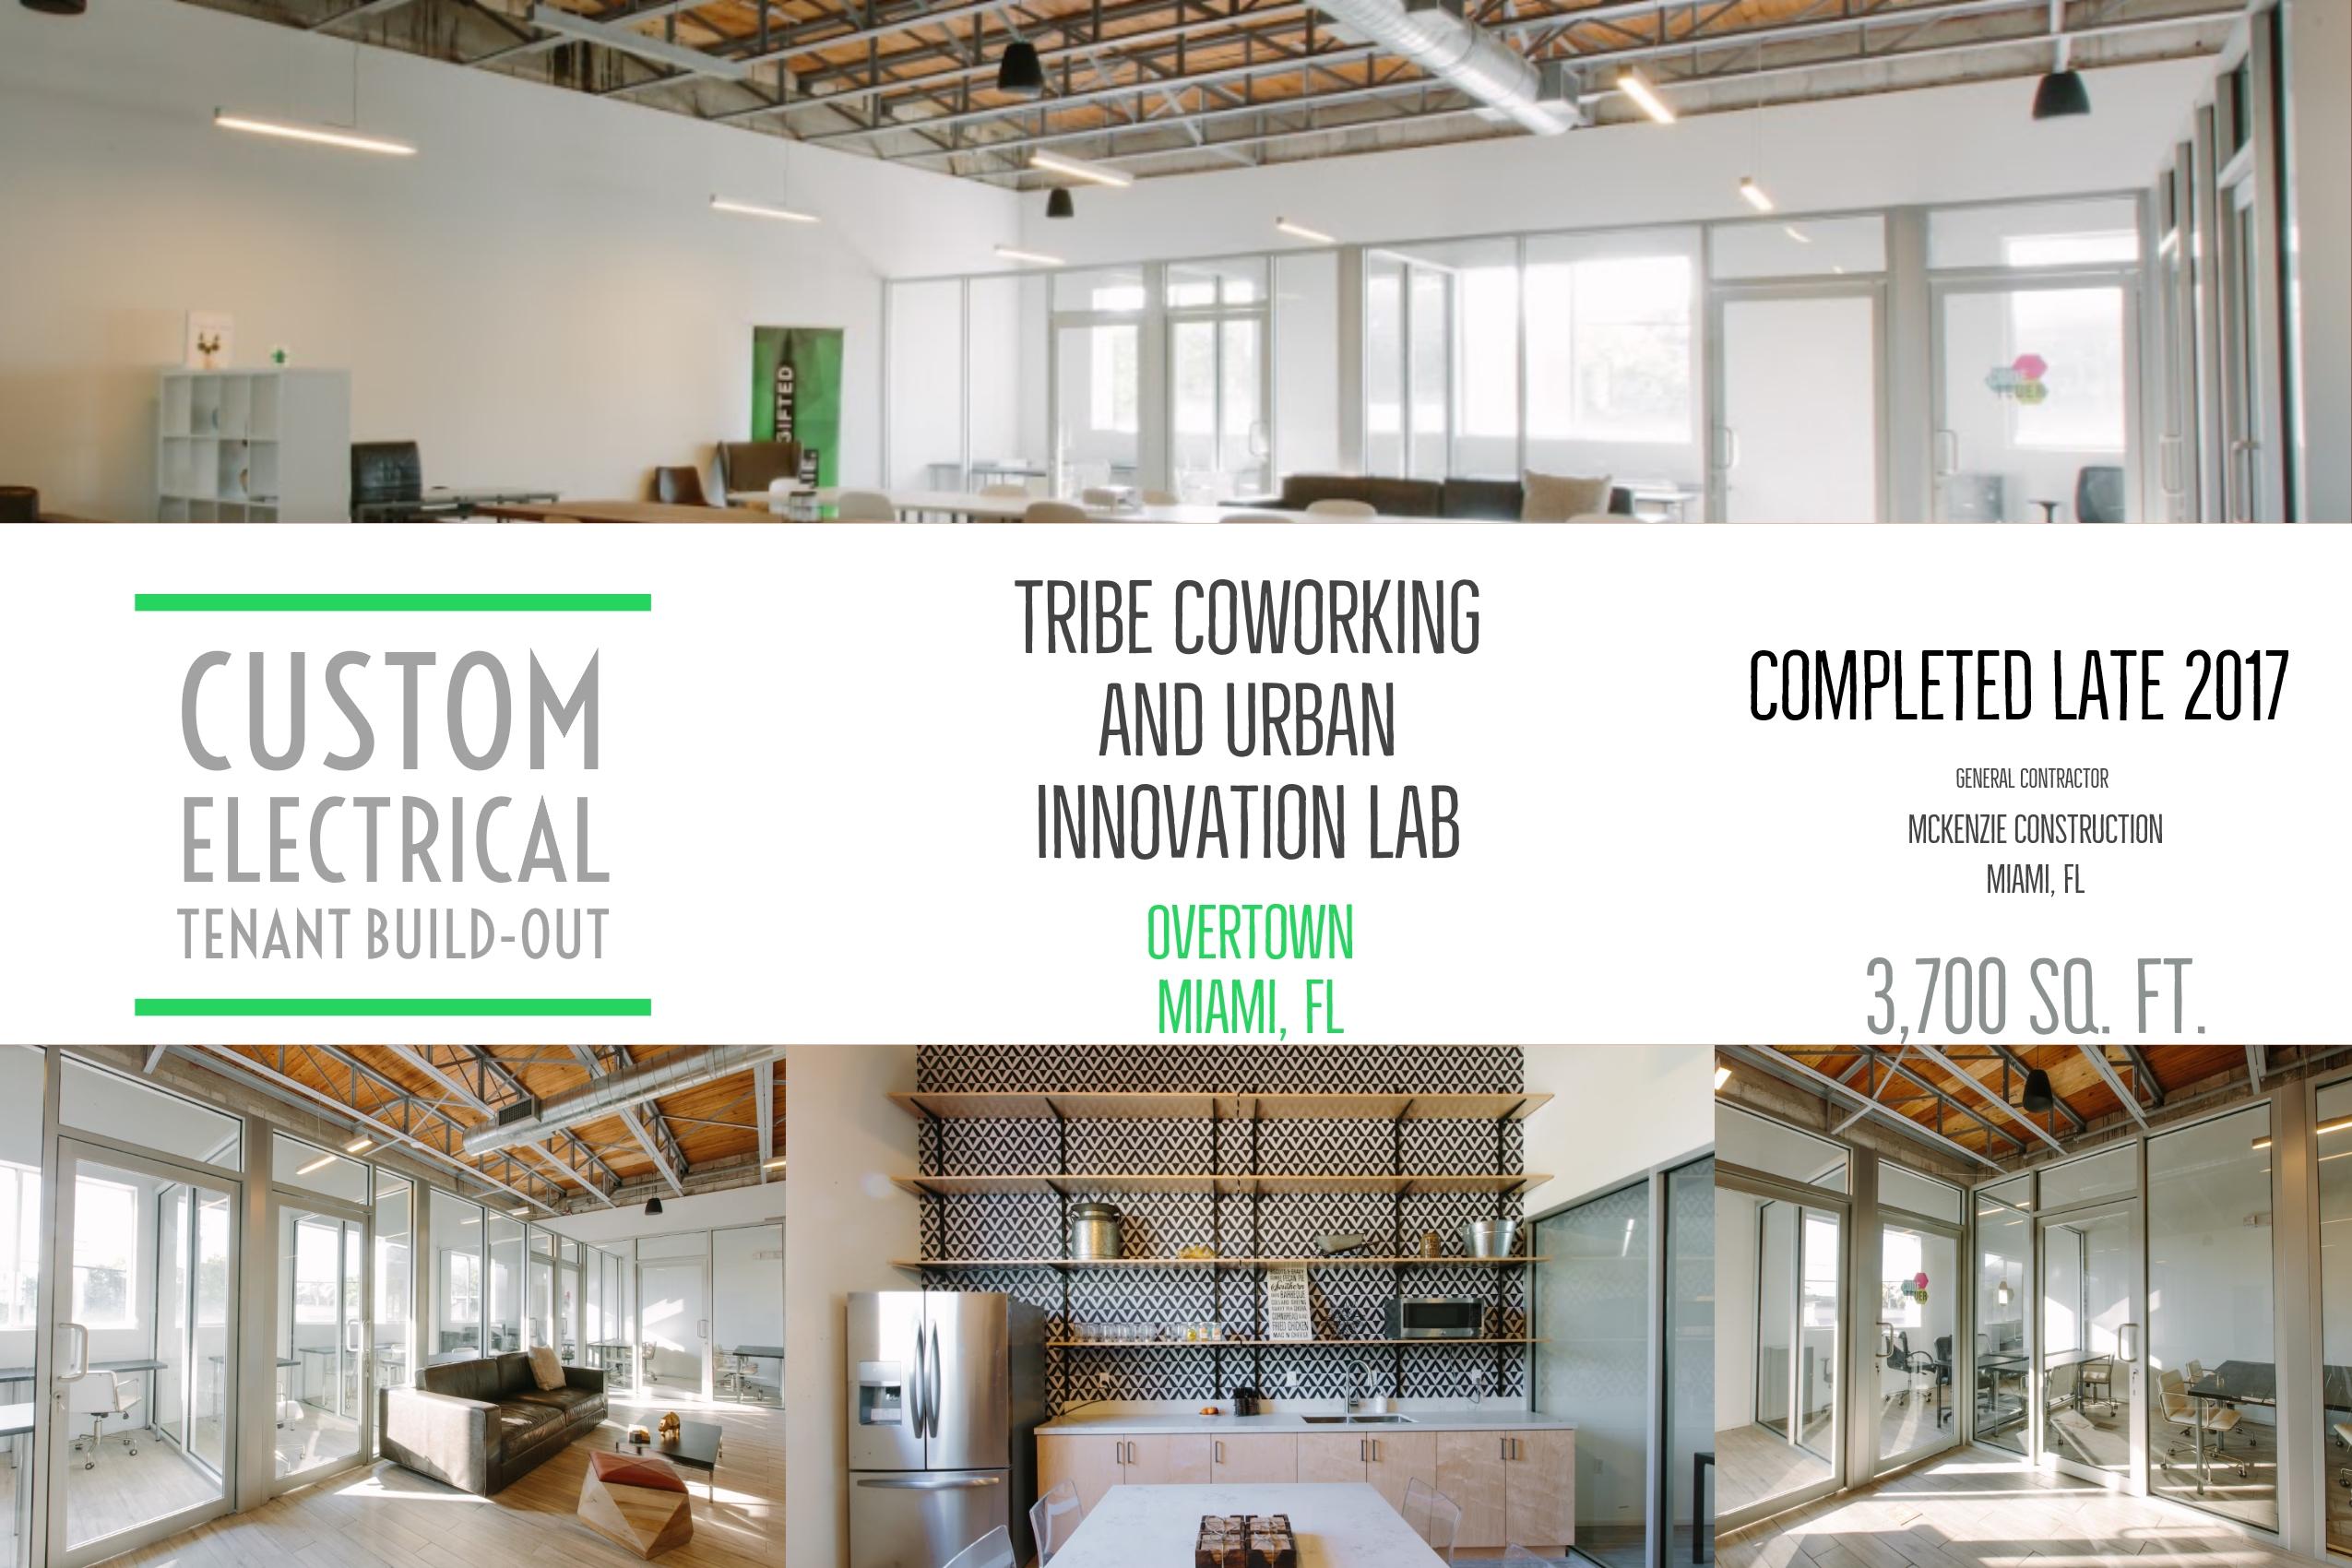 Tribe CoWorking & Urban Inv. Lab